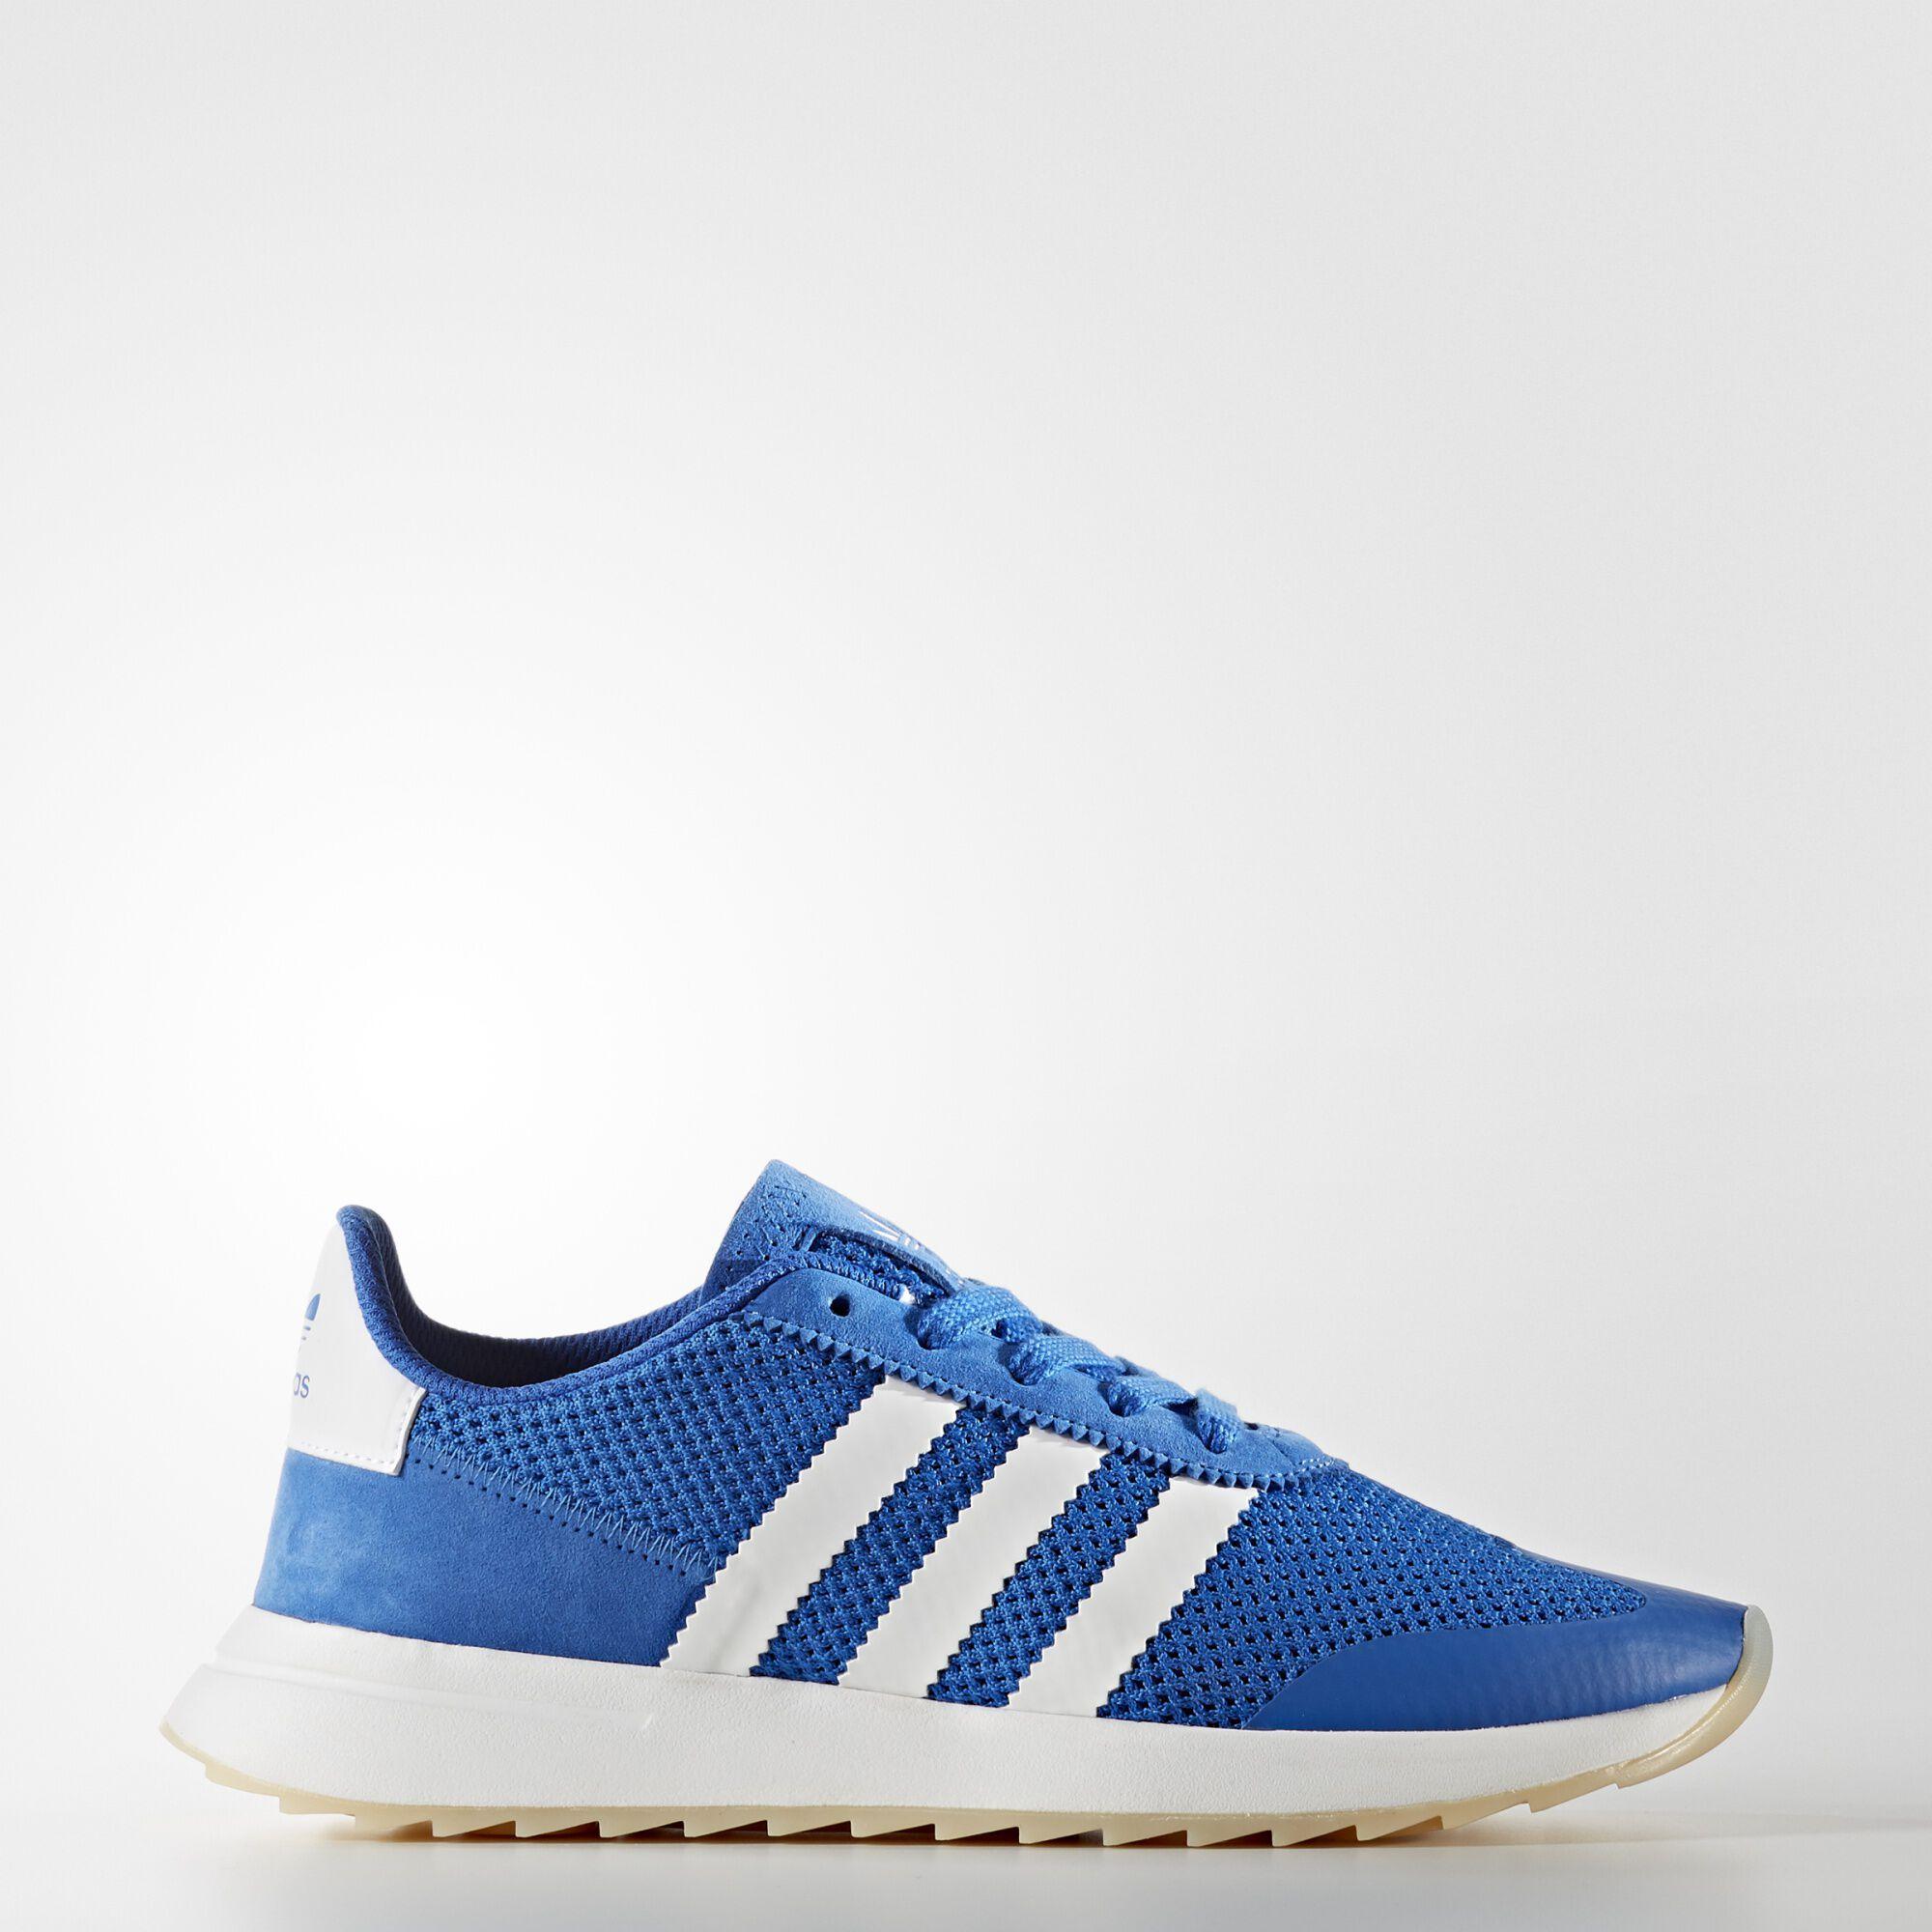 Model Women VS Jog BlueOrangeNavy By Adidas Neo Shoes Factory Price